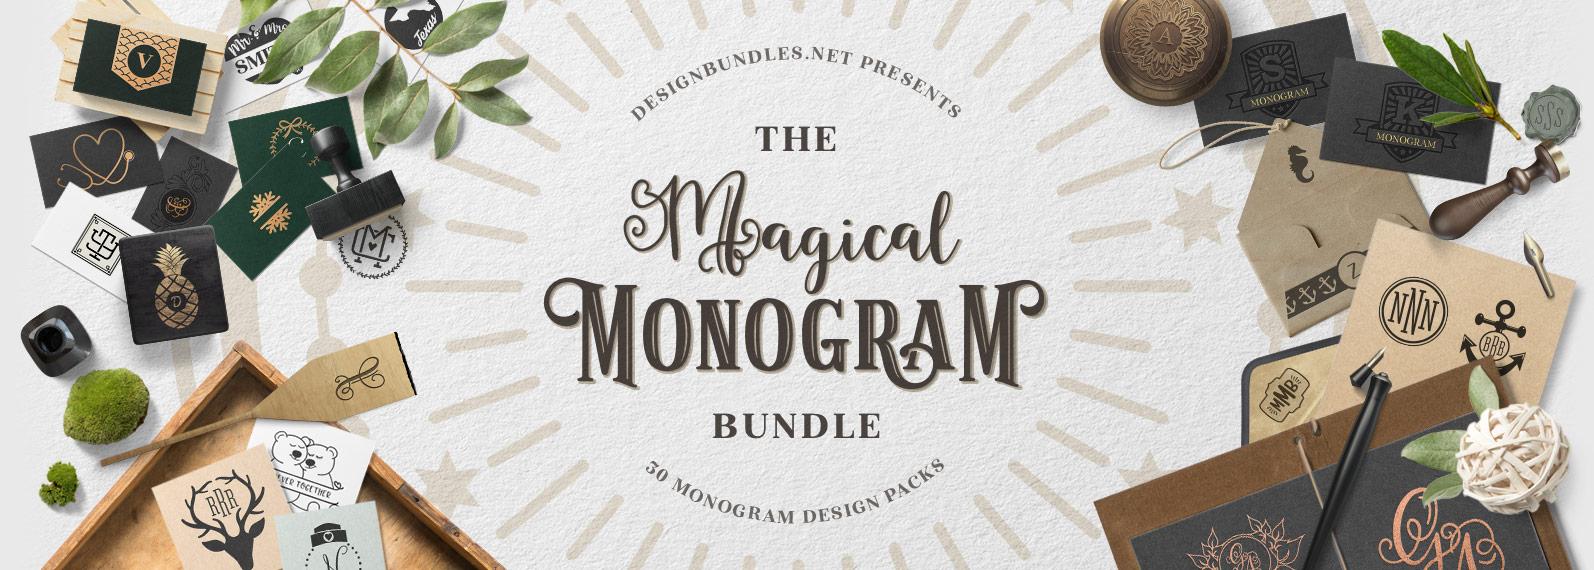 The Magical Monogram Bundle Cover